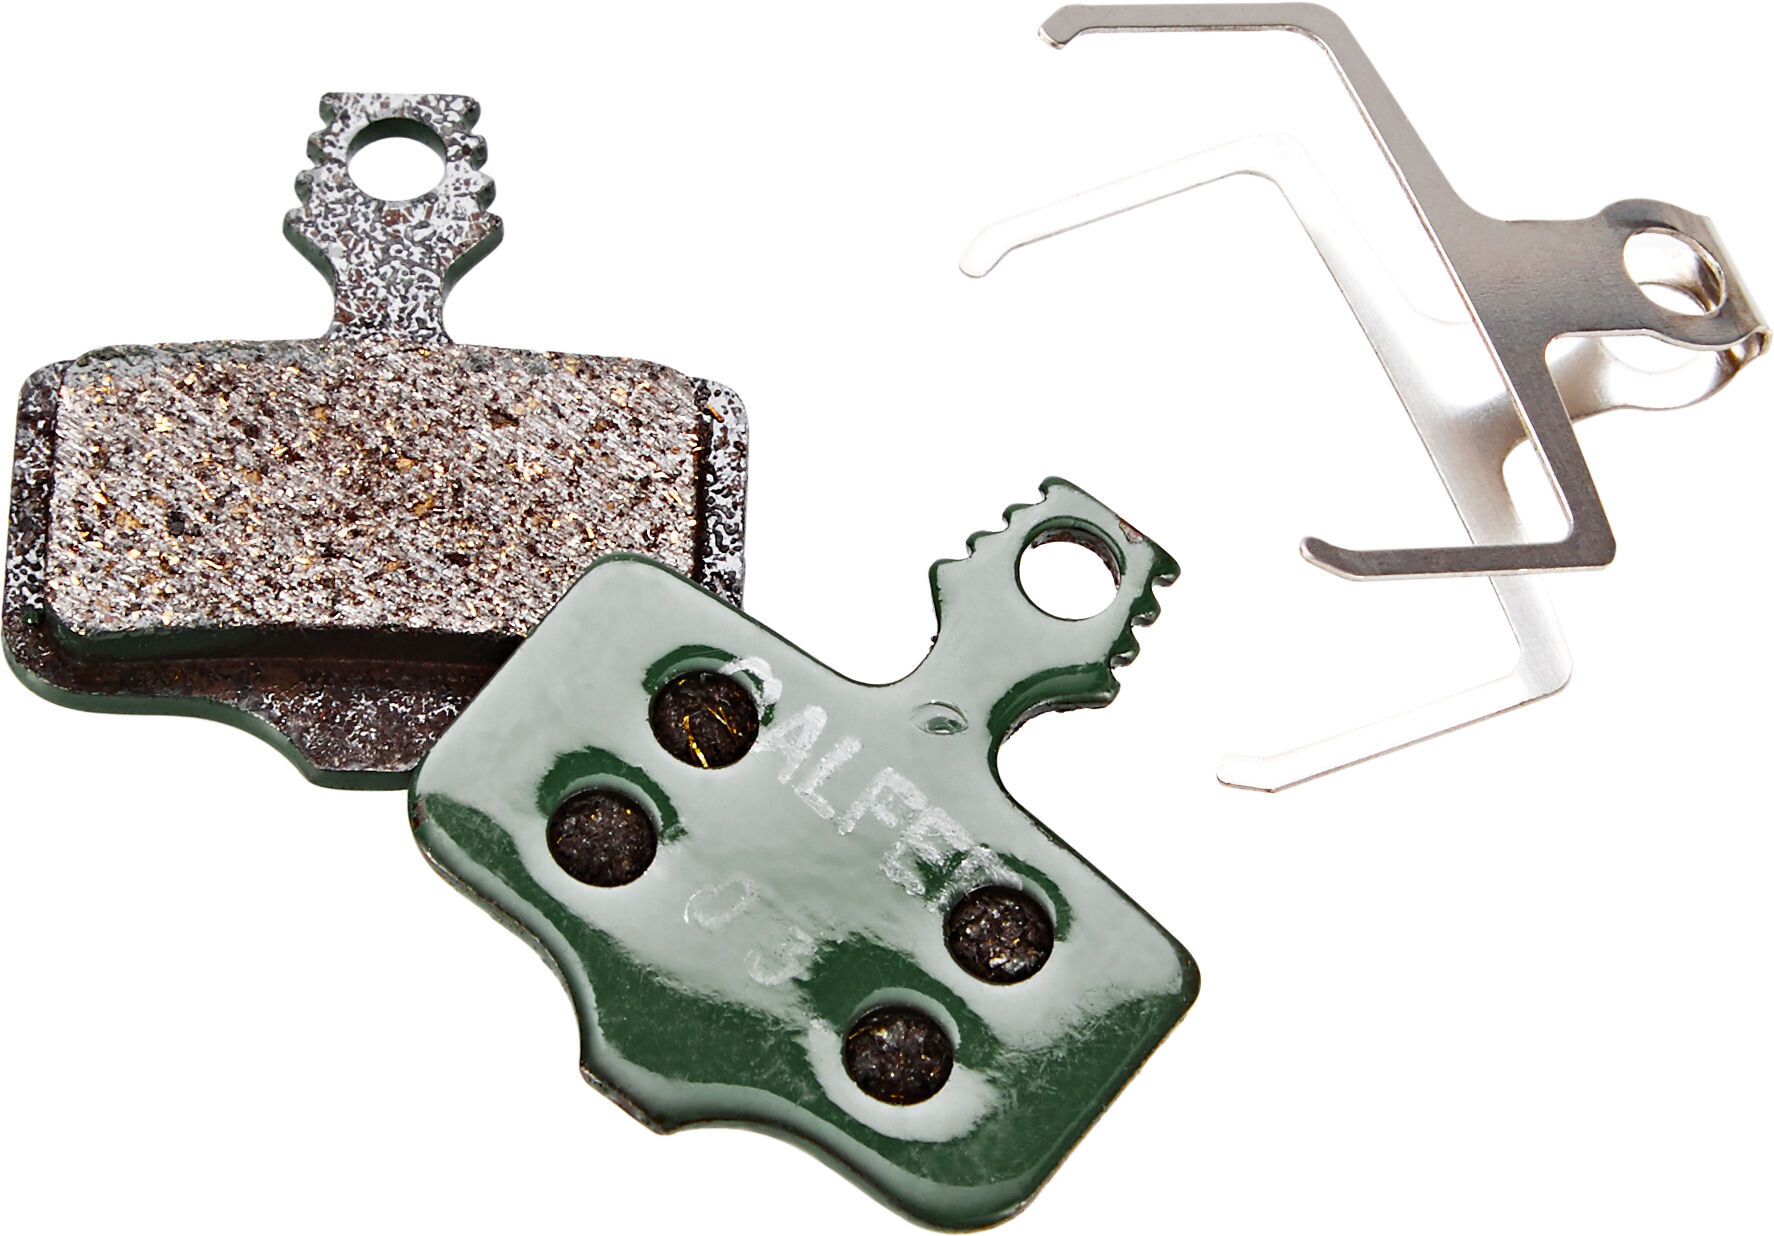 GALFER BIKE Pro Bremsebelægninger, avid elixir 1,3,5,7 xx,xo (2019)   Brake pads